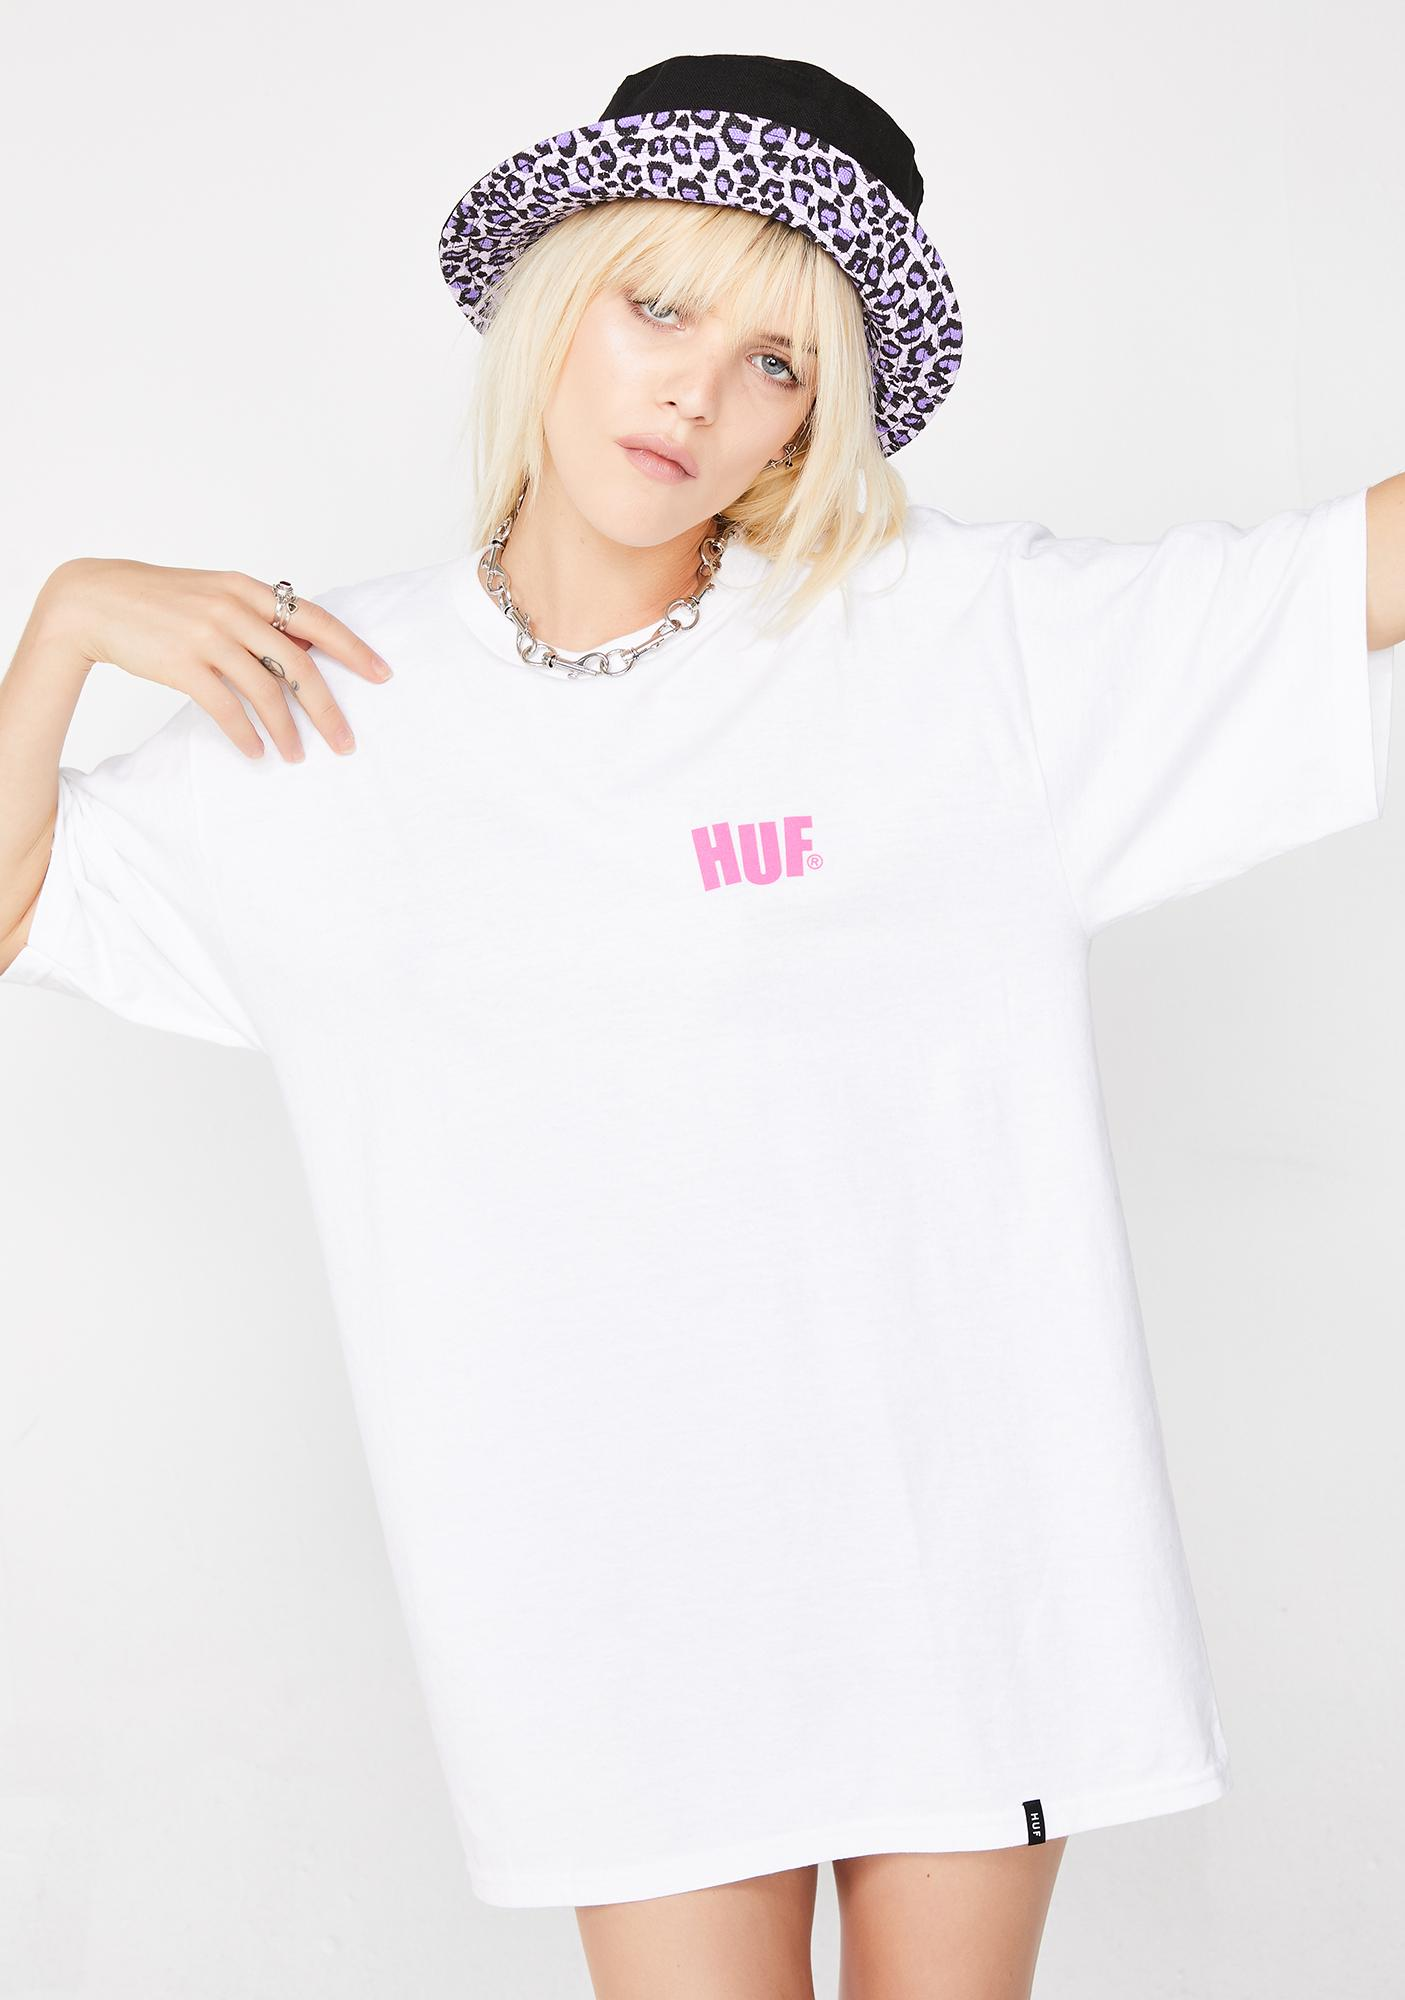 HUF Huf City Rockers Short Sleeve Tee